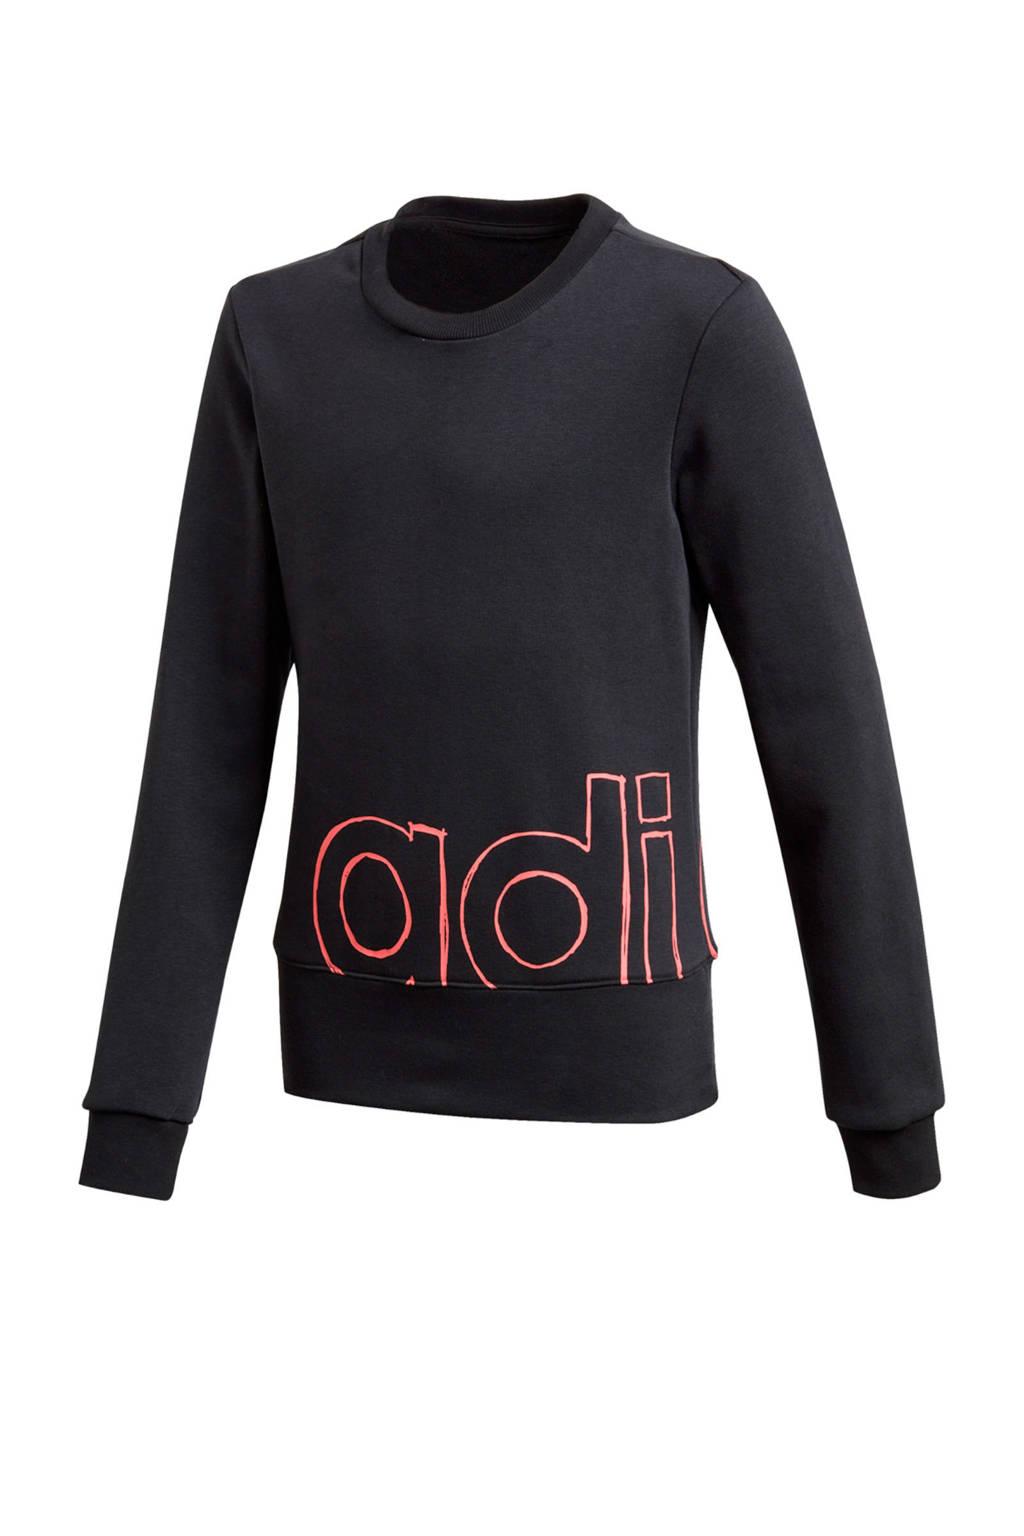 adidas Performance sportsweater zwart/roze, Zwart/roze